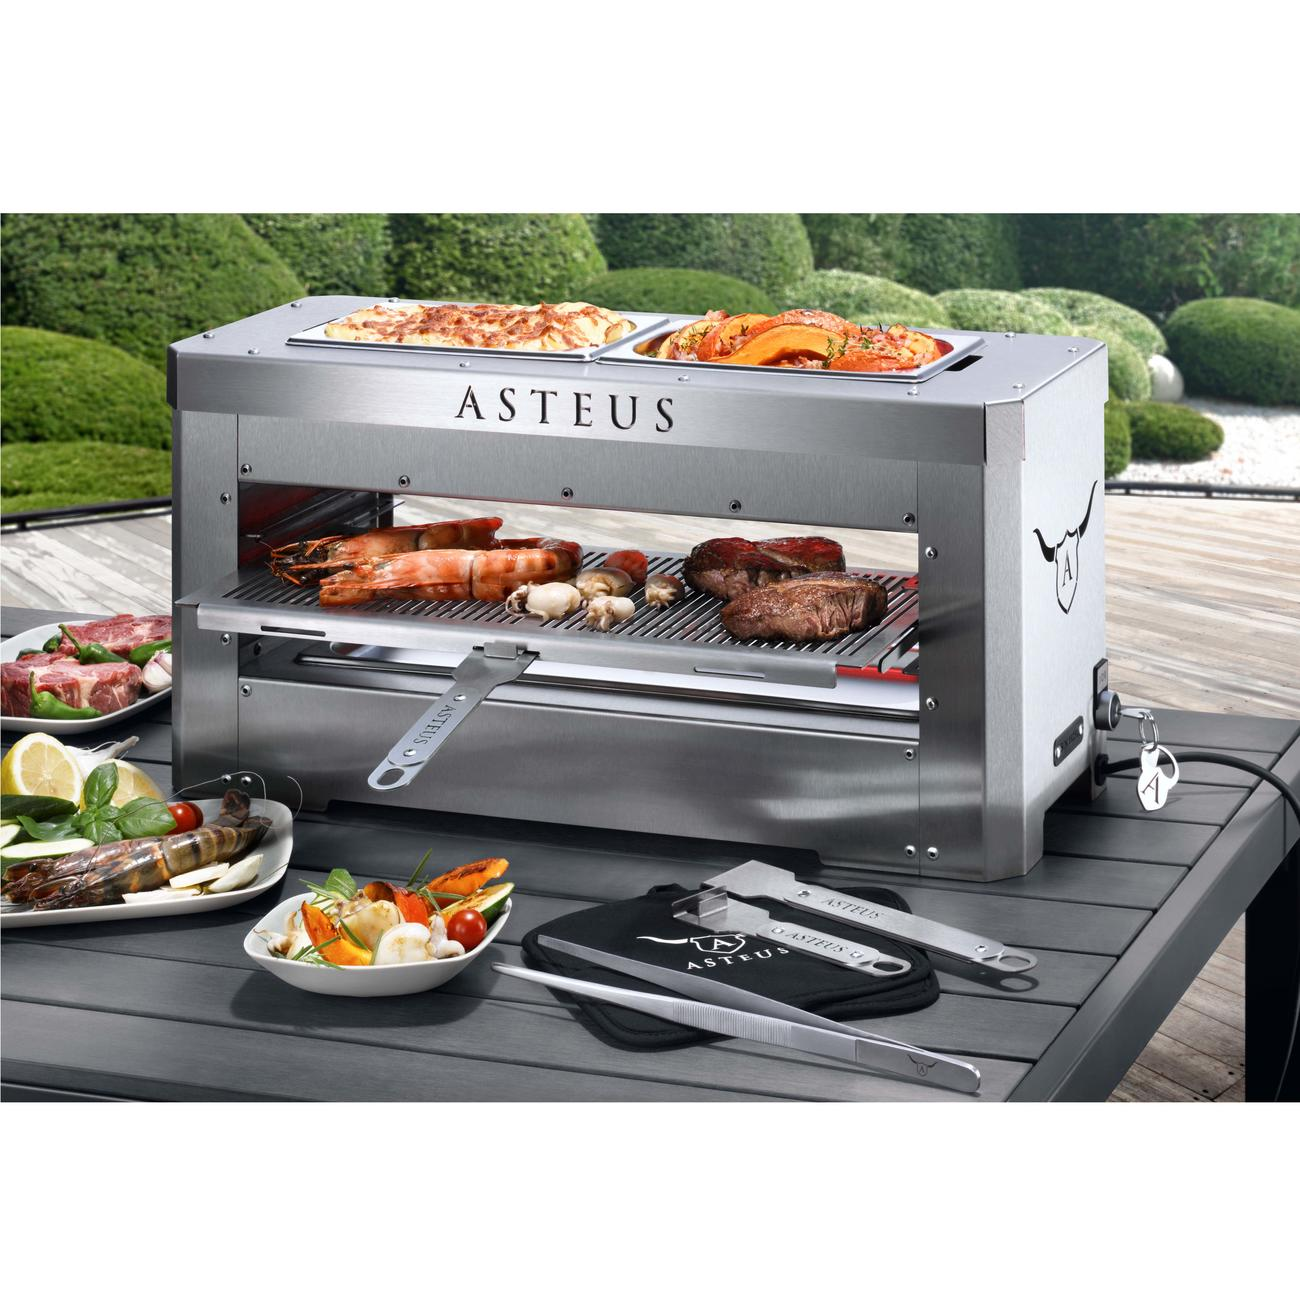 asteus steaker elektro infrarot grill ca 42x25x34 cm. Black Bedroom Furniture Sets. Home Design Ideas